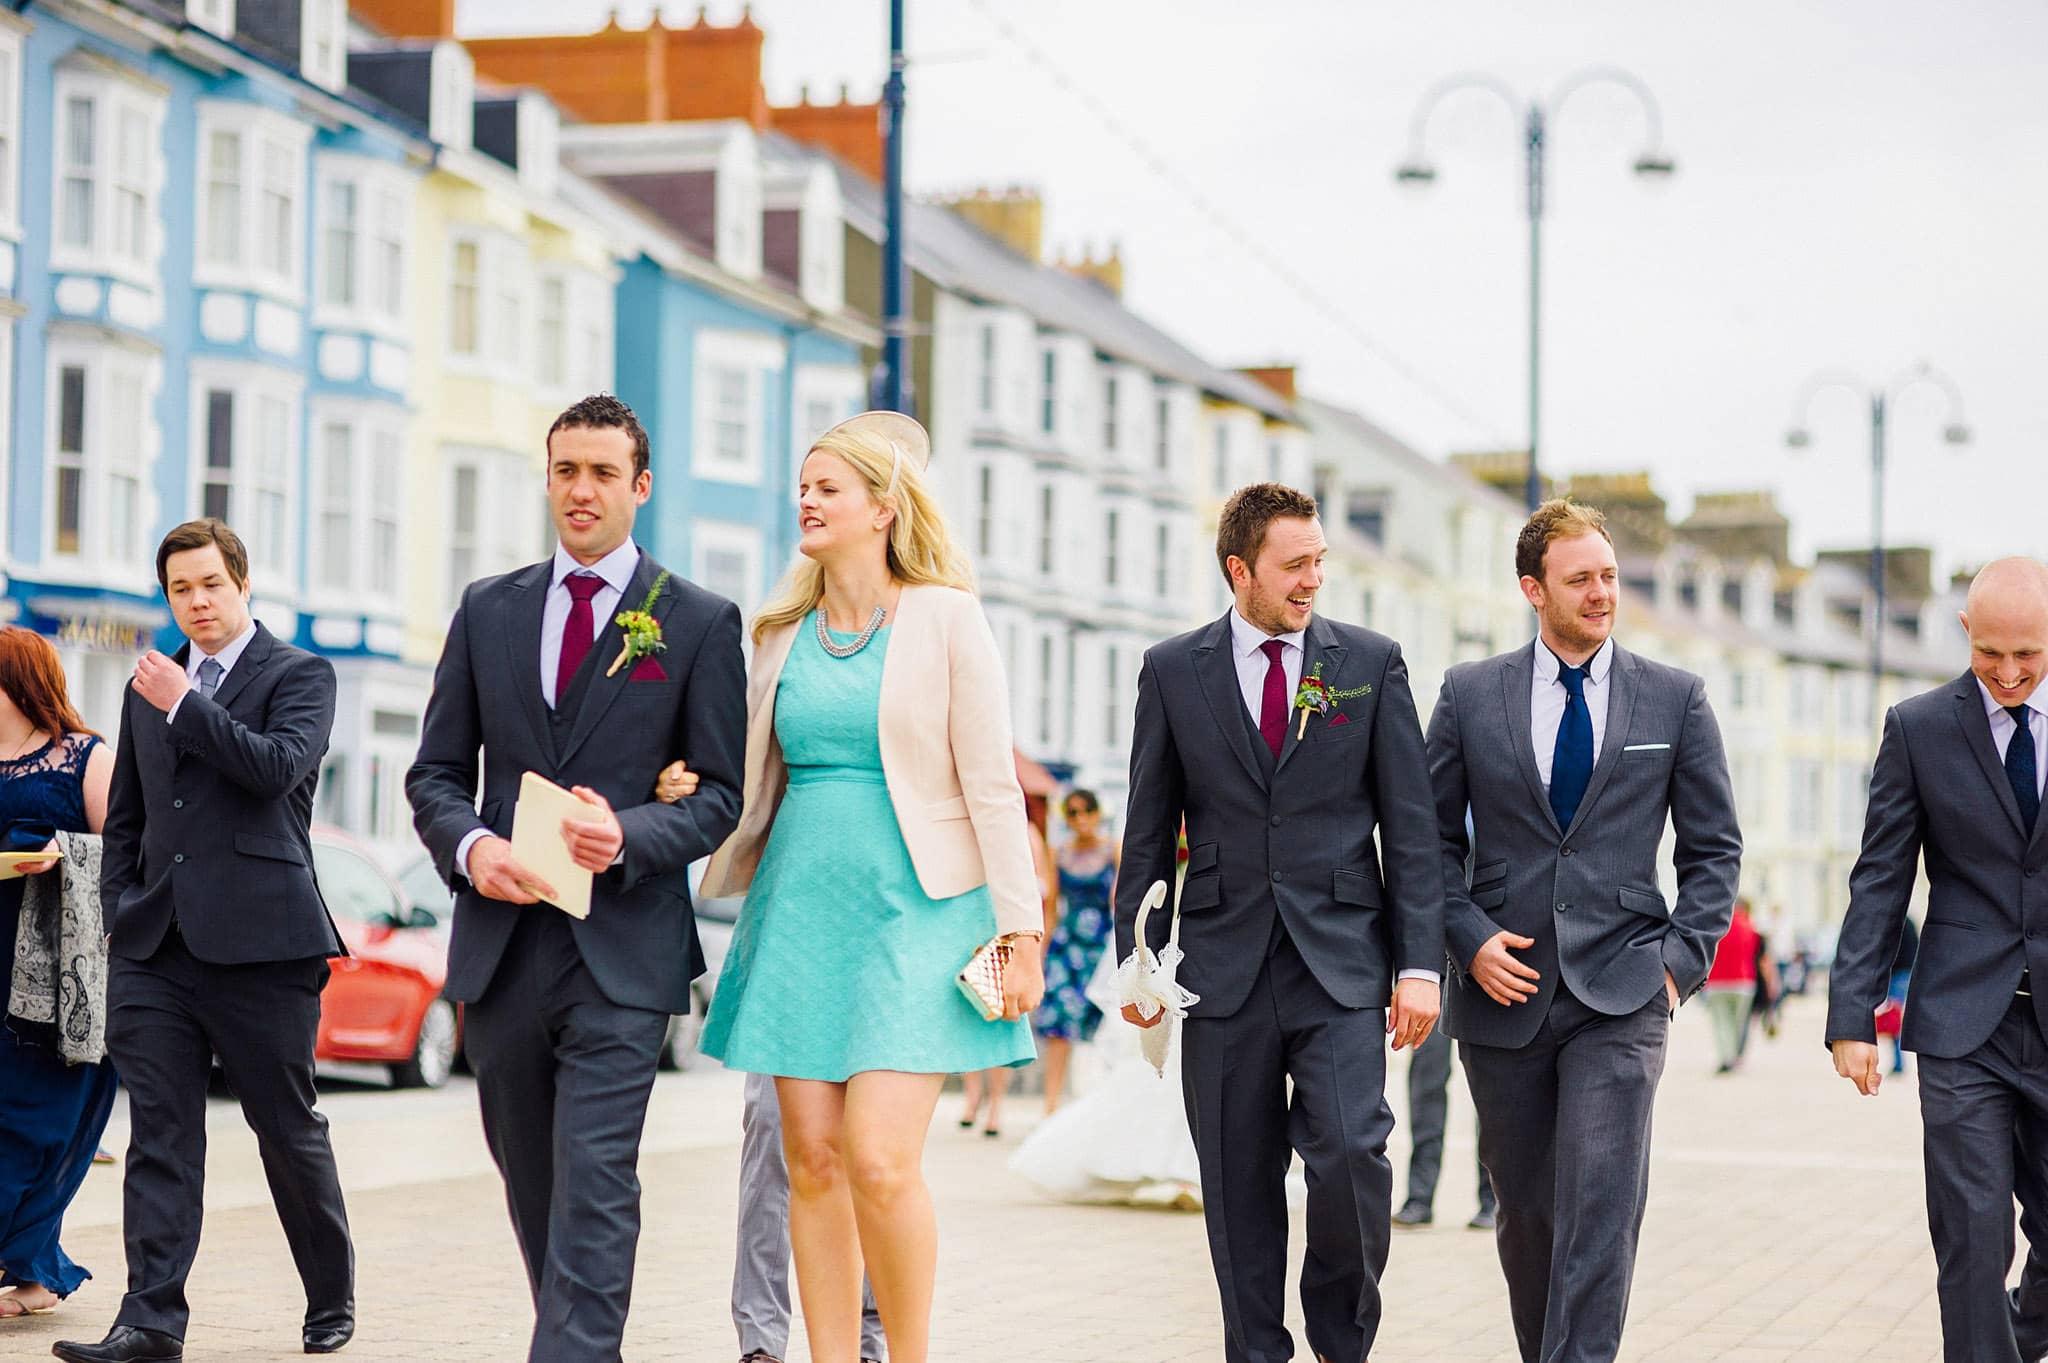 wedding-photographer-aberystwyth-wales (103)